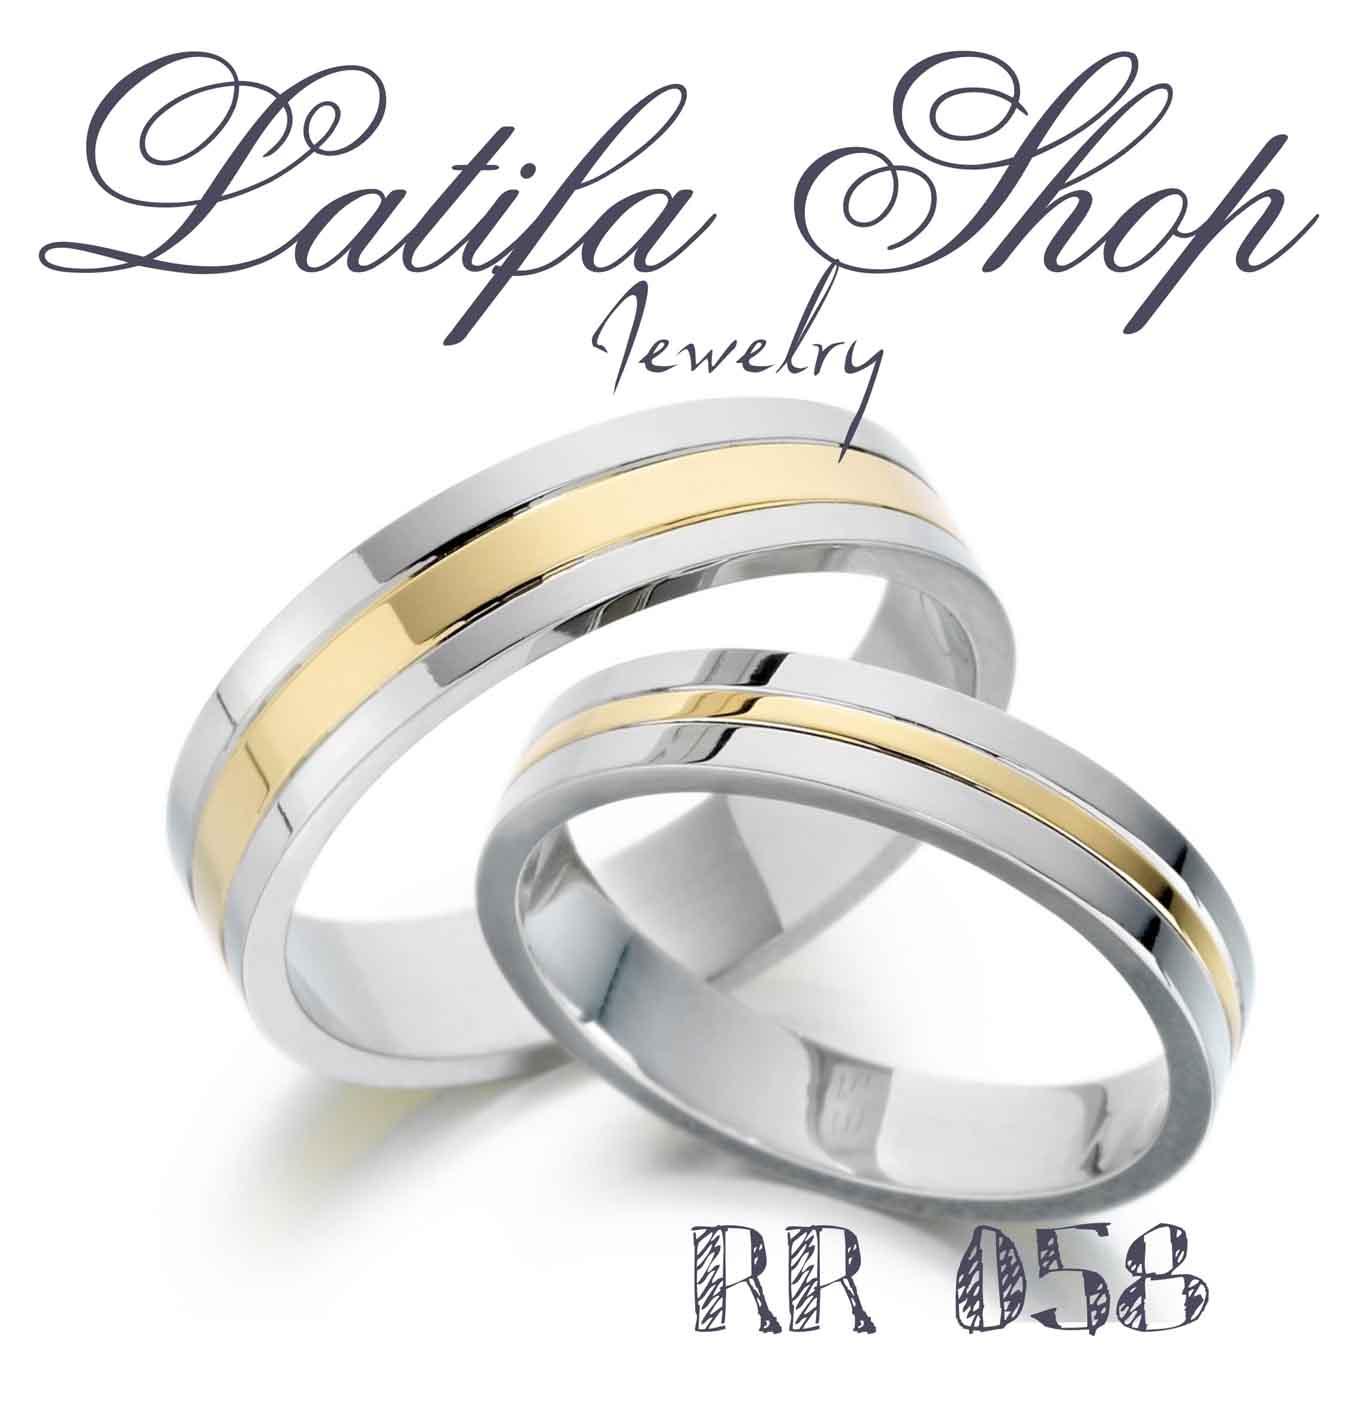 Rr58 Cincin Kawin Cincin Perak Cincin Tunangan Cincin Nikah Cincin Emas Putih Cincin Emas